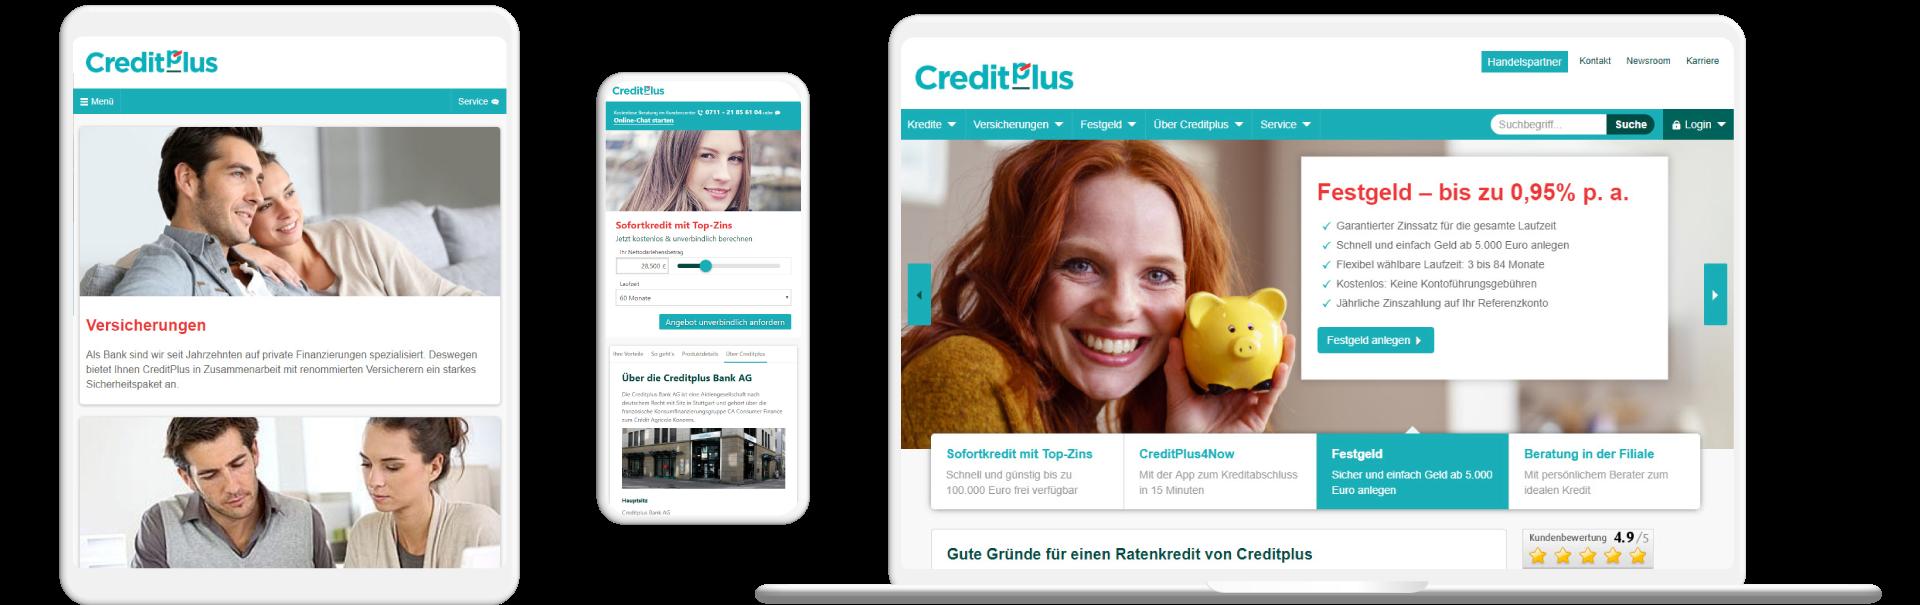 Screens Creditplus